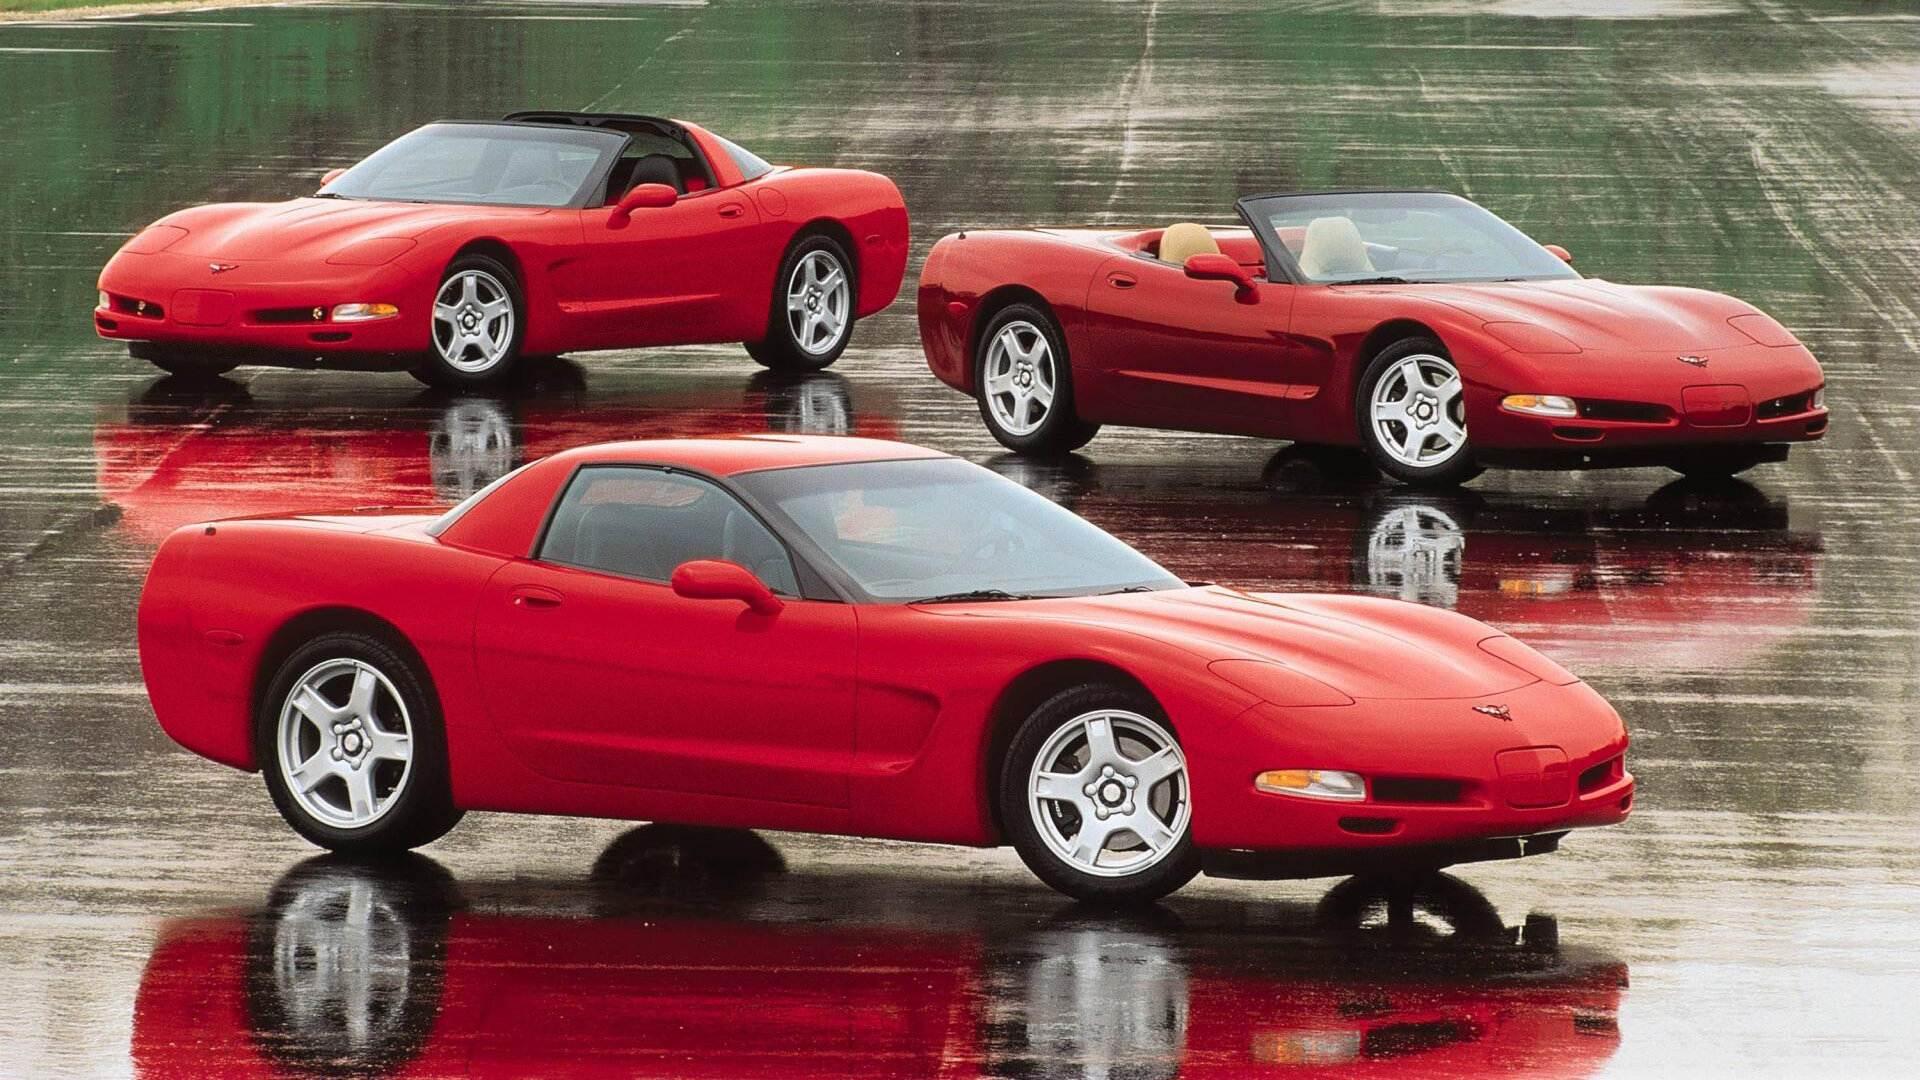 Coche del día: Chevrolet Corvette (C5)